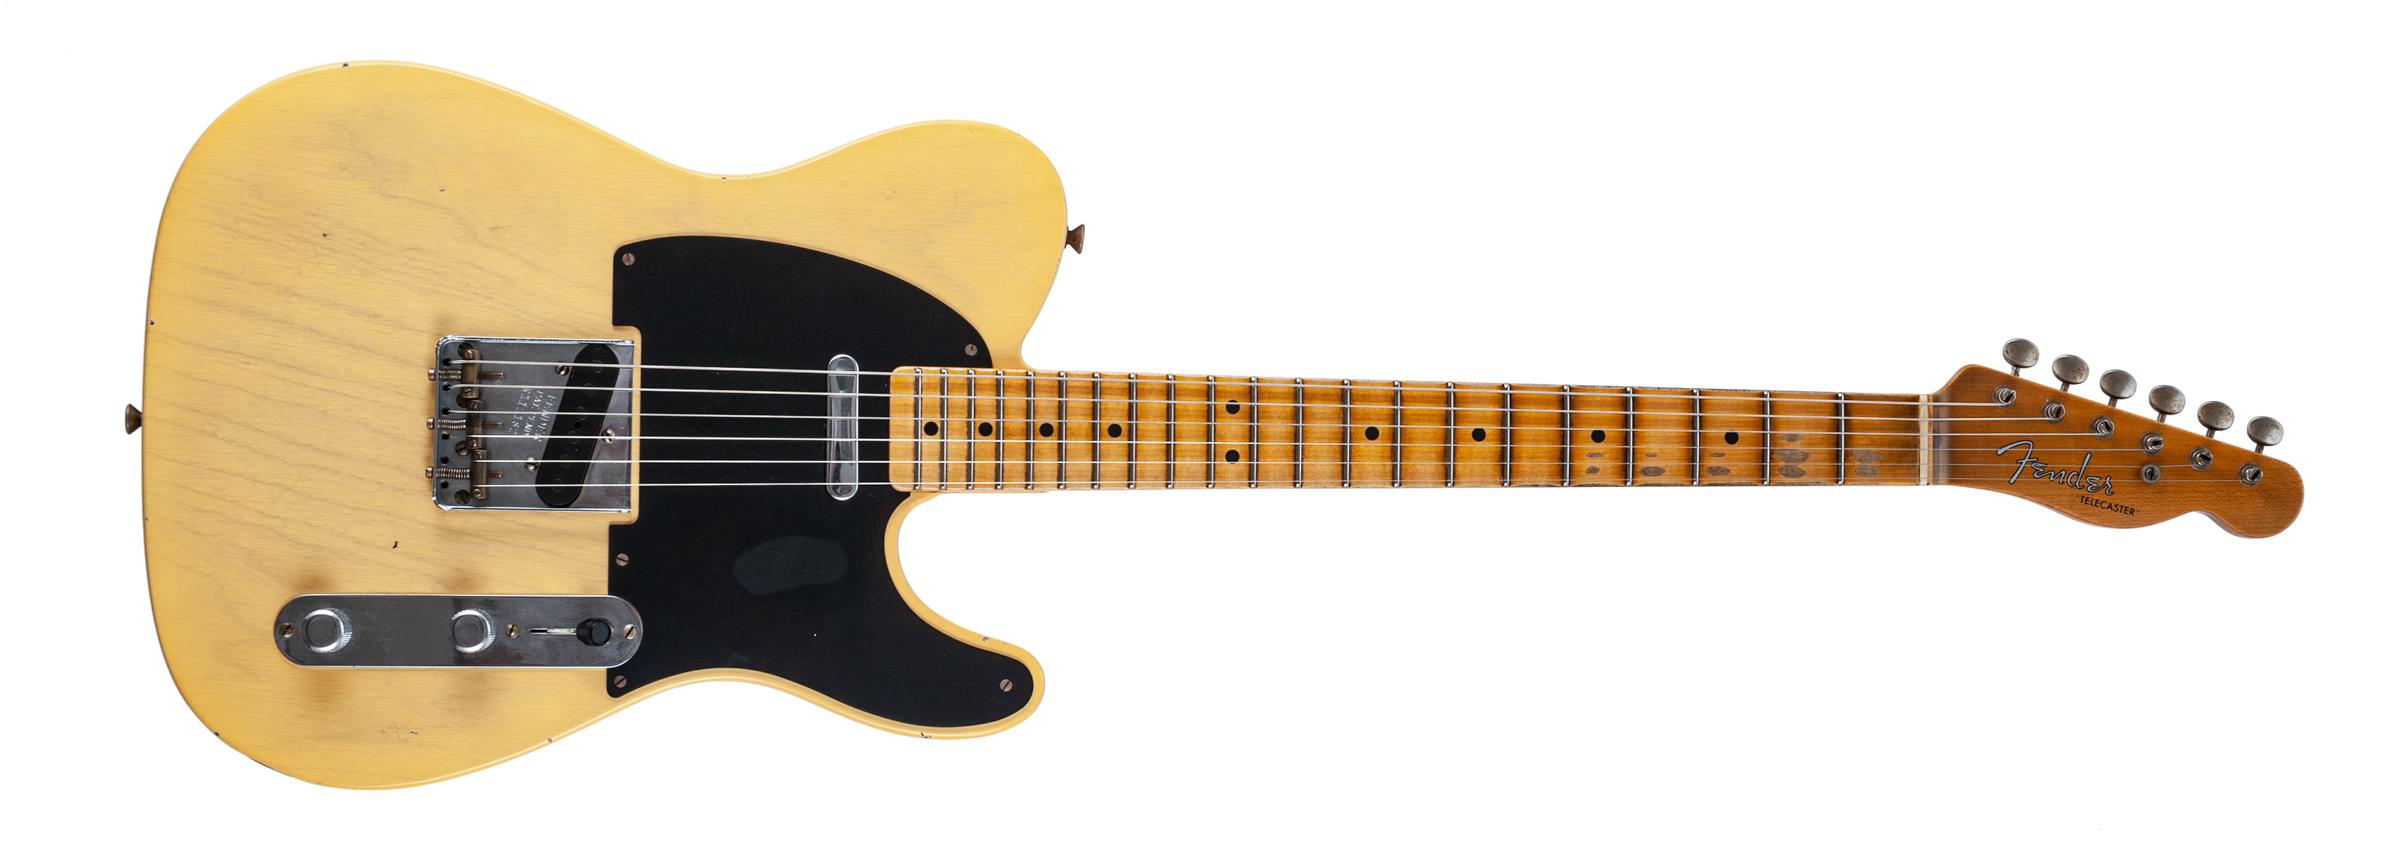 Fender Limited Edition '51 Telecaster Journeyman Relic, Maple Fingerboard, Aged Nocaster Blonde